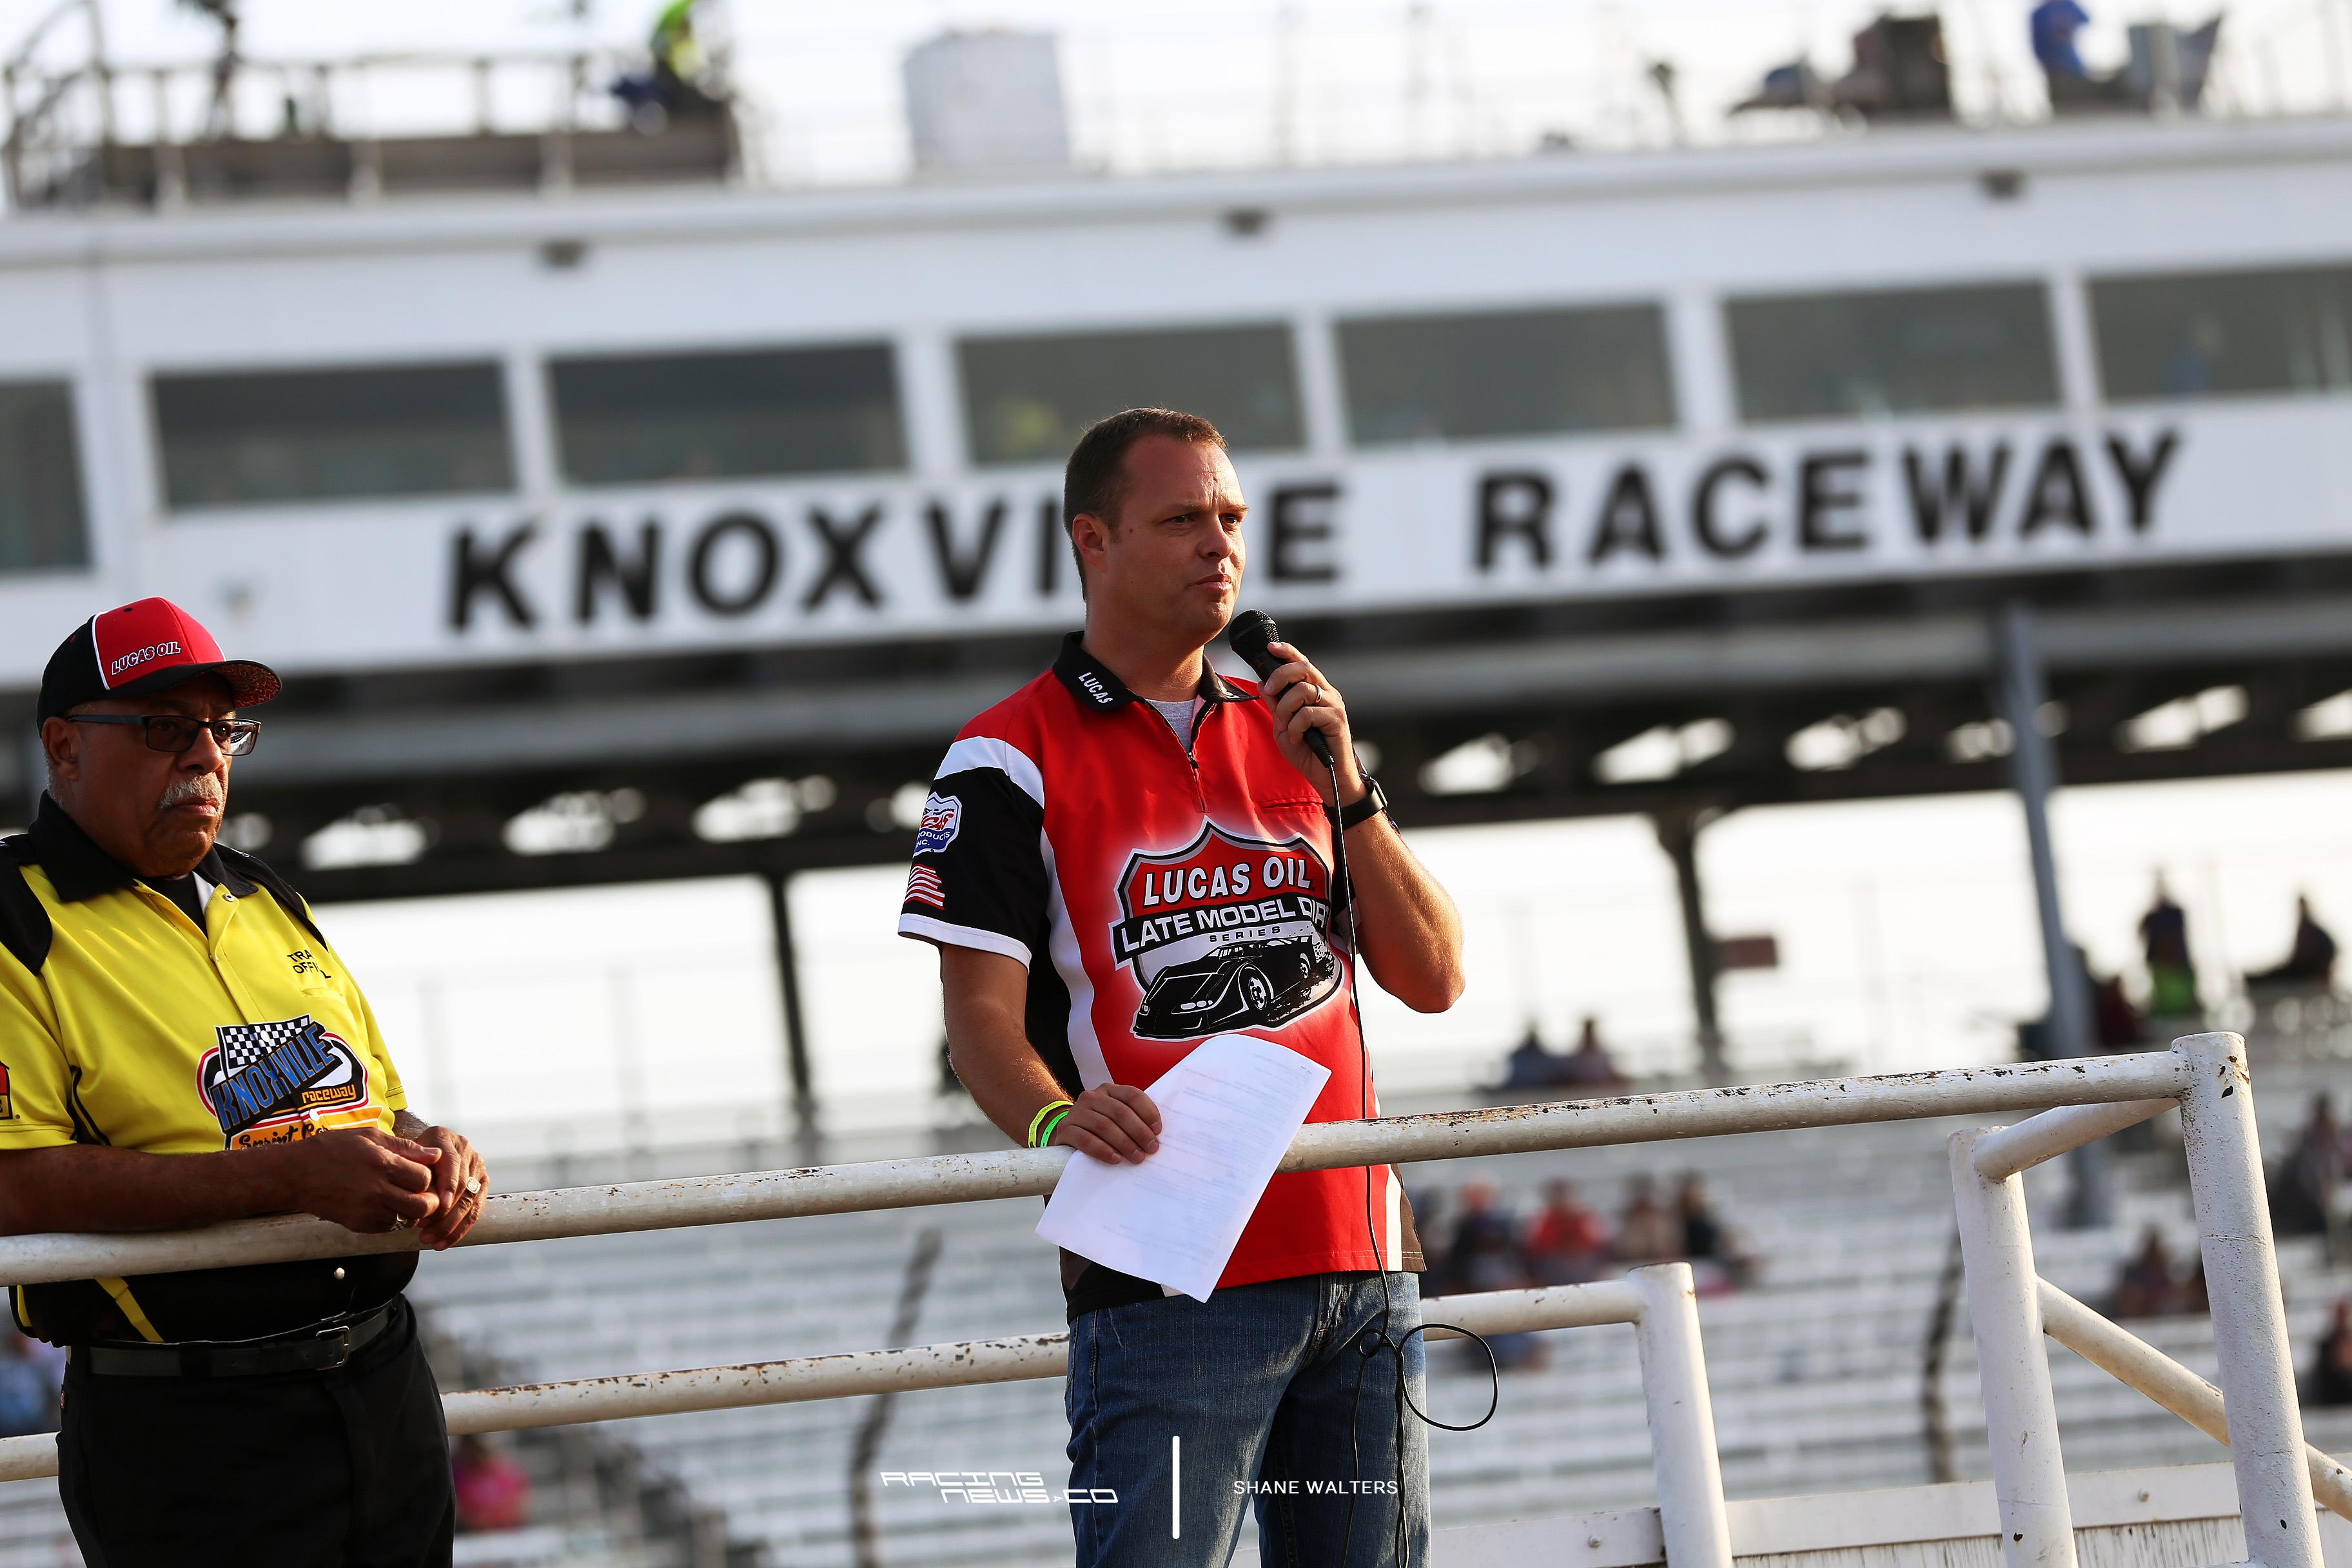 Rick Schwallie at Knoxville Raceway 5928